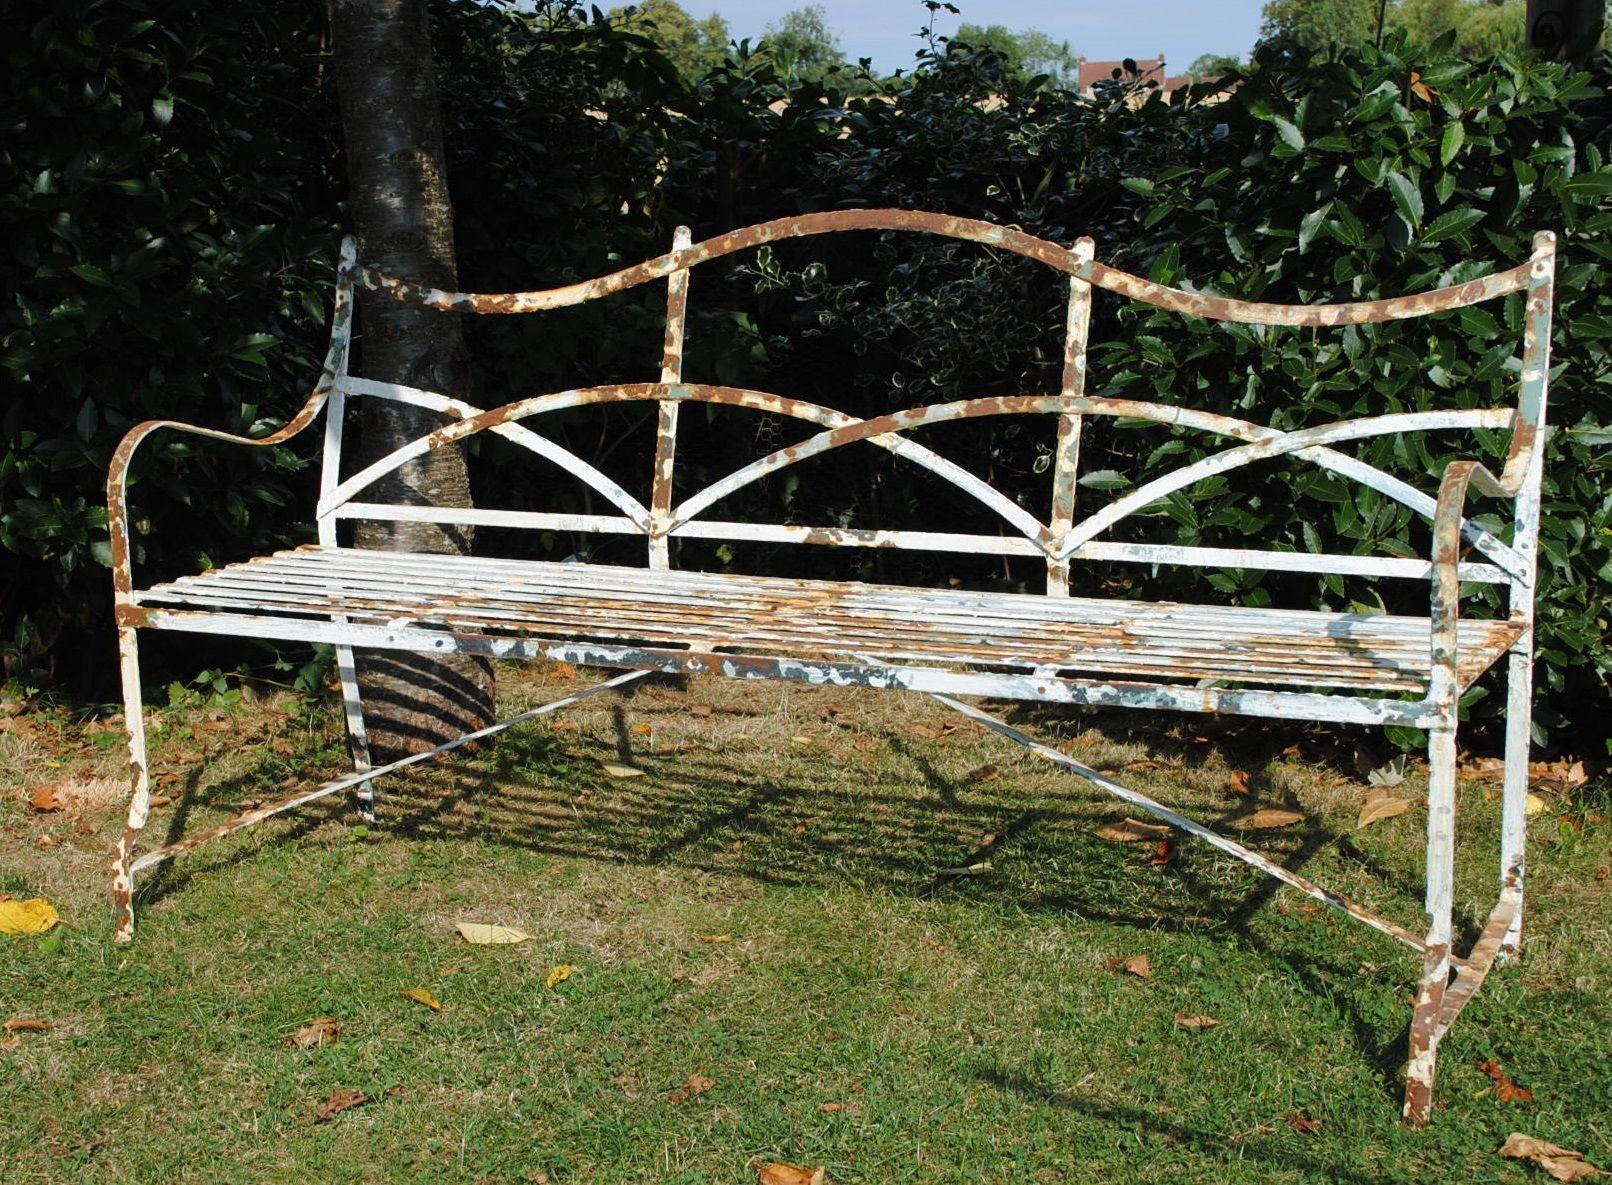 Download Wallpaper Wrought Iron Patio Furniture Greenville Sc